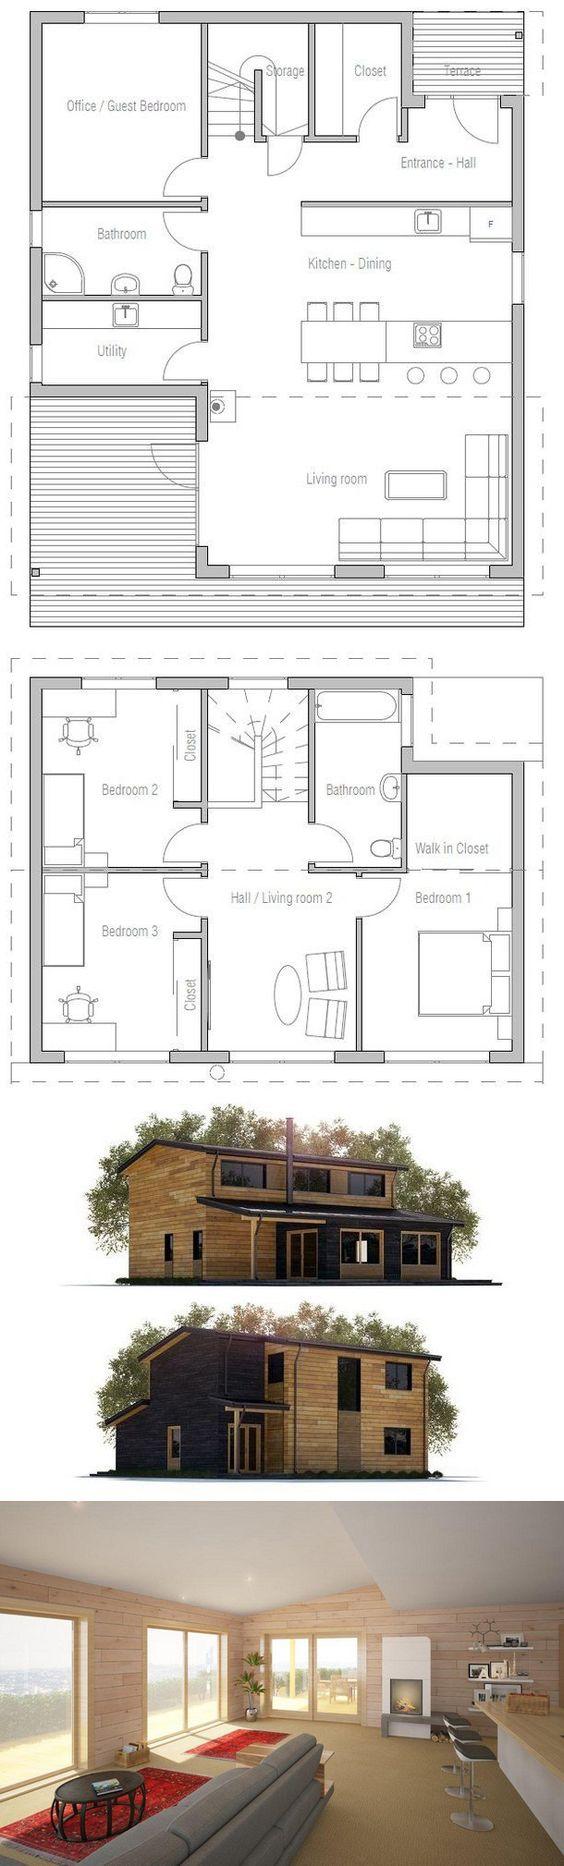 157 m² - 4 chambres - 1 Etage